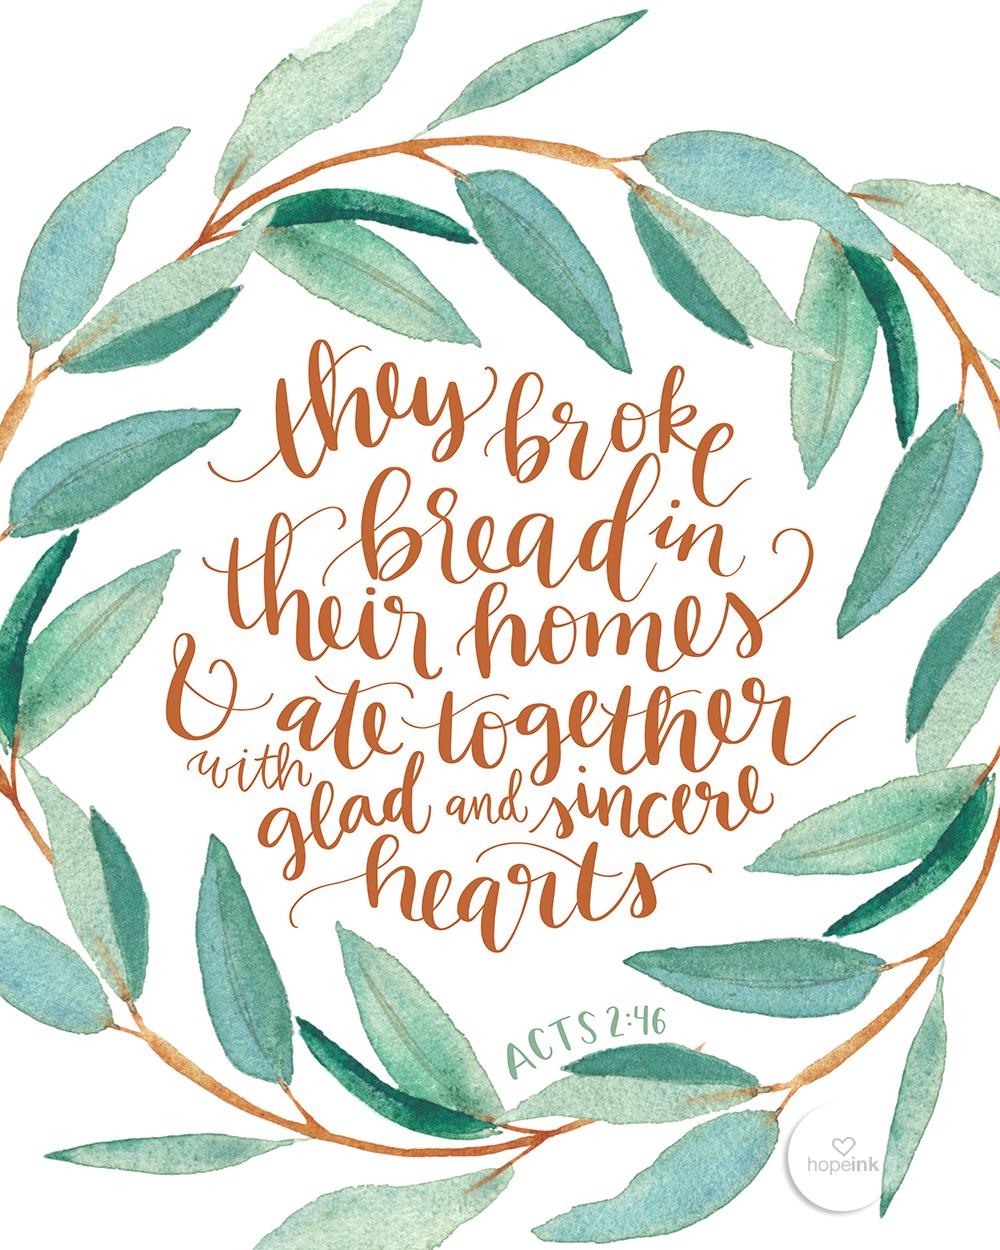 They Broke Break In Their Homes Together | Hand Lettered Scripture Art | Hope Ink.jpg